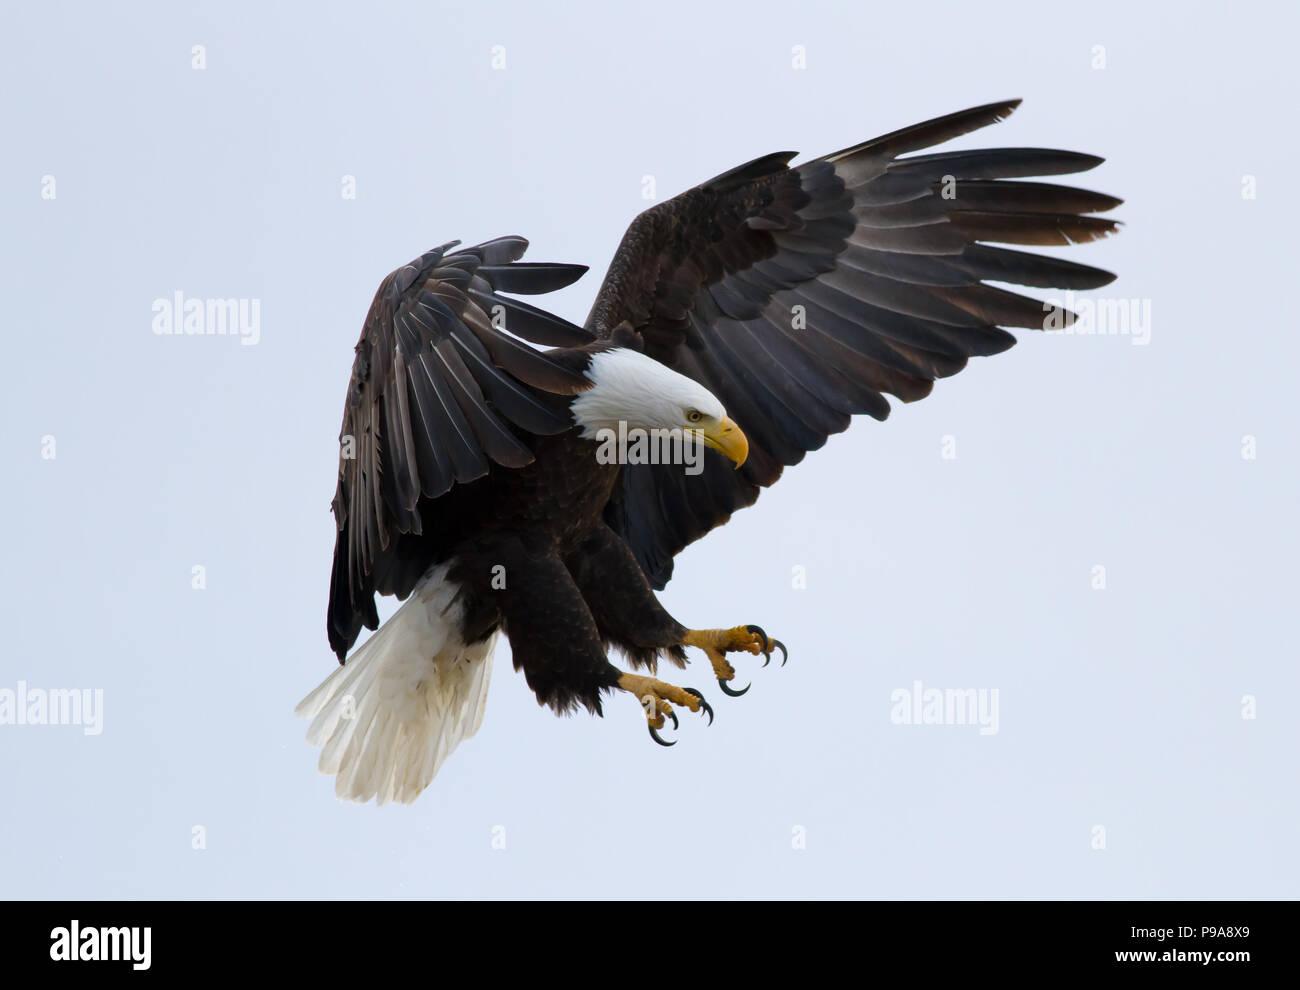 American Bald Eagle Bird Wings Open Lands in Nest Wall Picture Black Framed